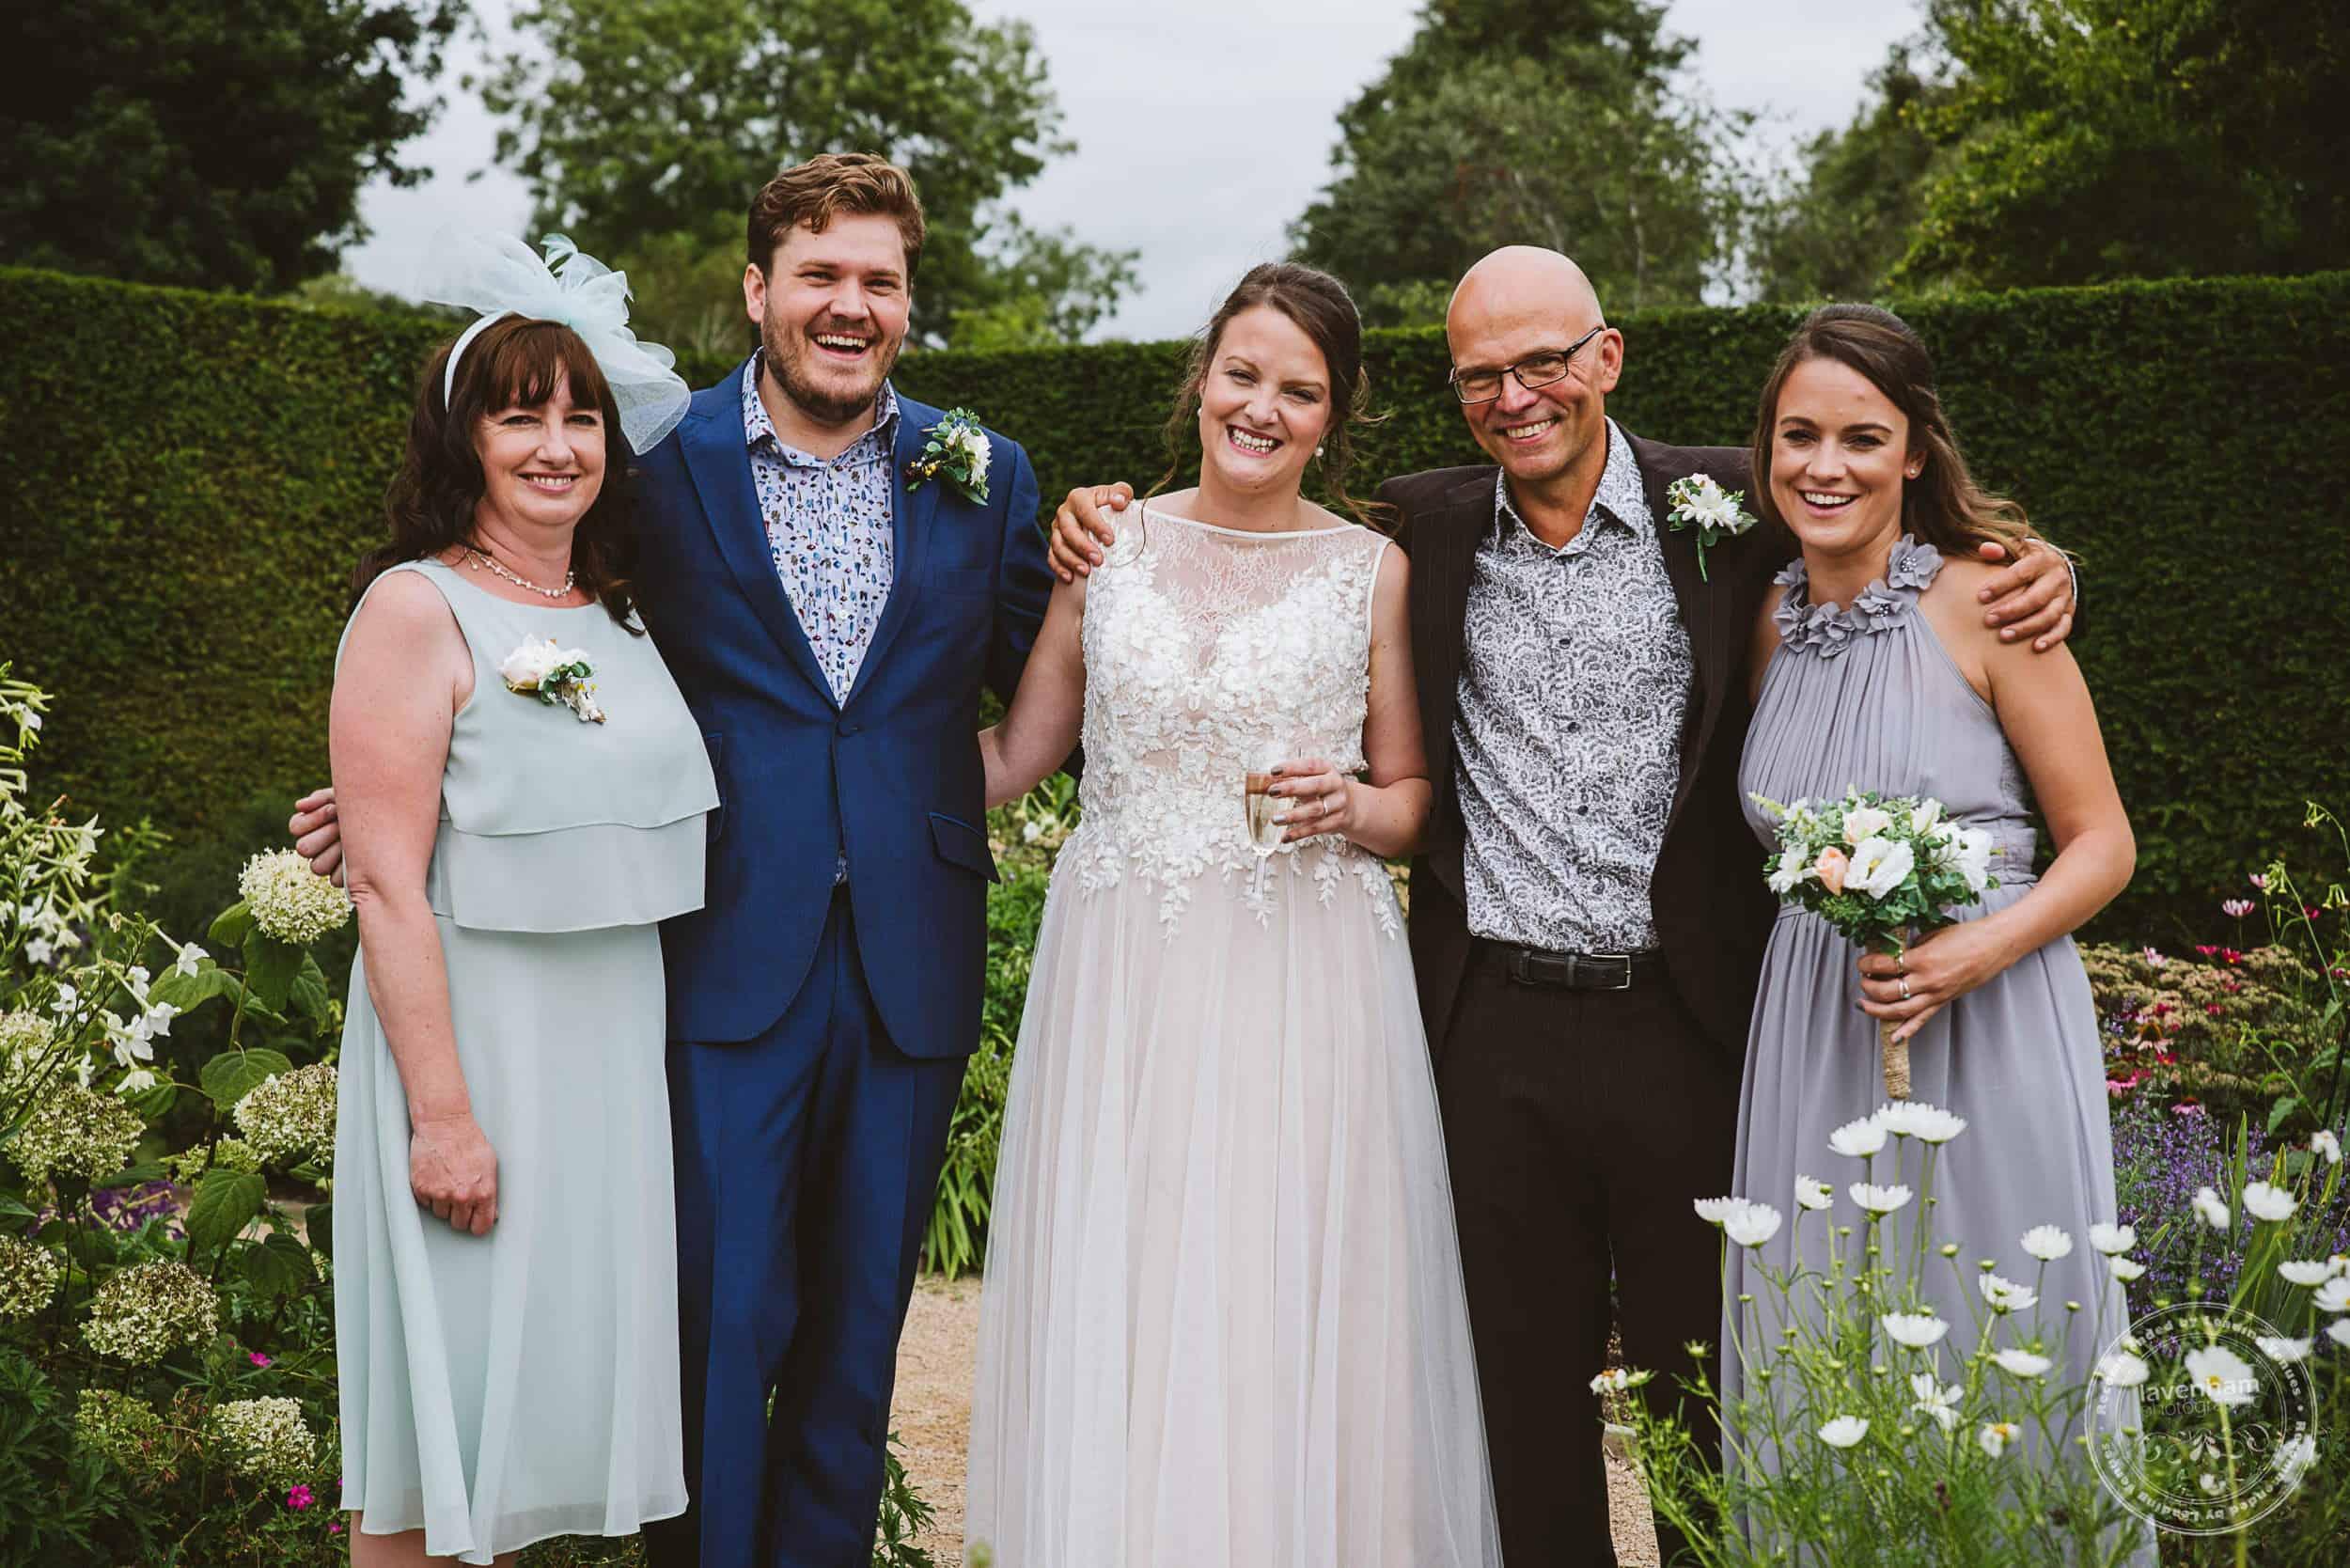 180818 Marks Hall Wedding Photography Lavenham Photographic 087